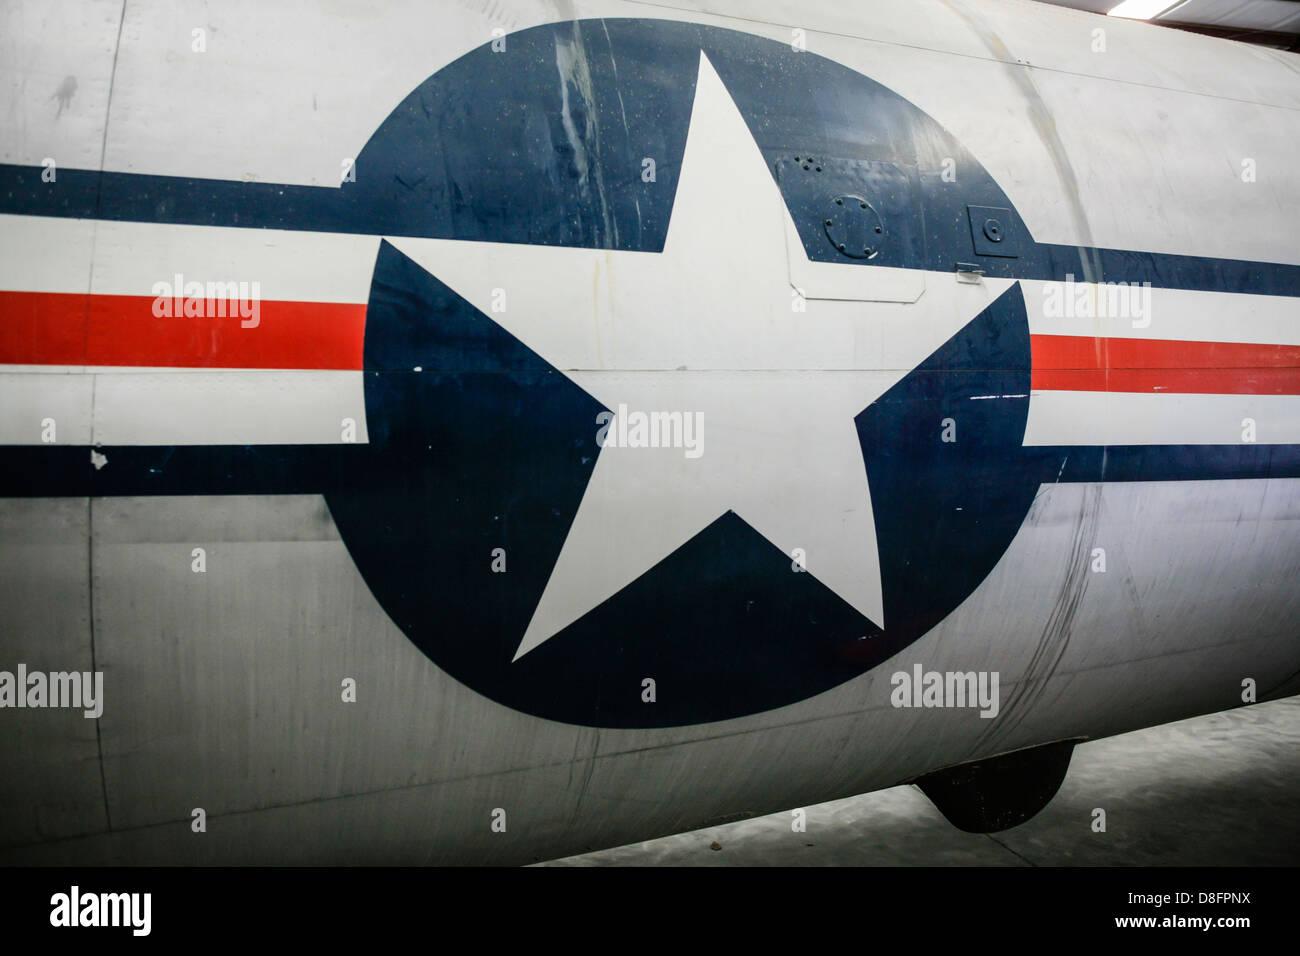 A semi-restored B29 in the Storage Hangar at the Fantasy of Flight Museum FL - Stock Image